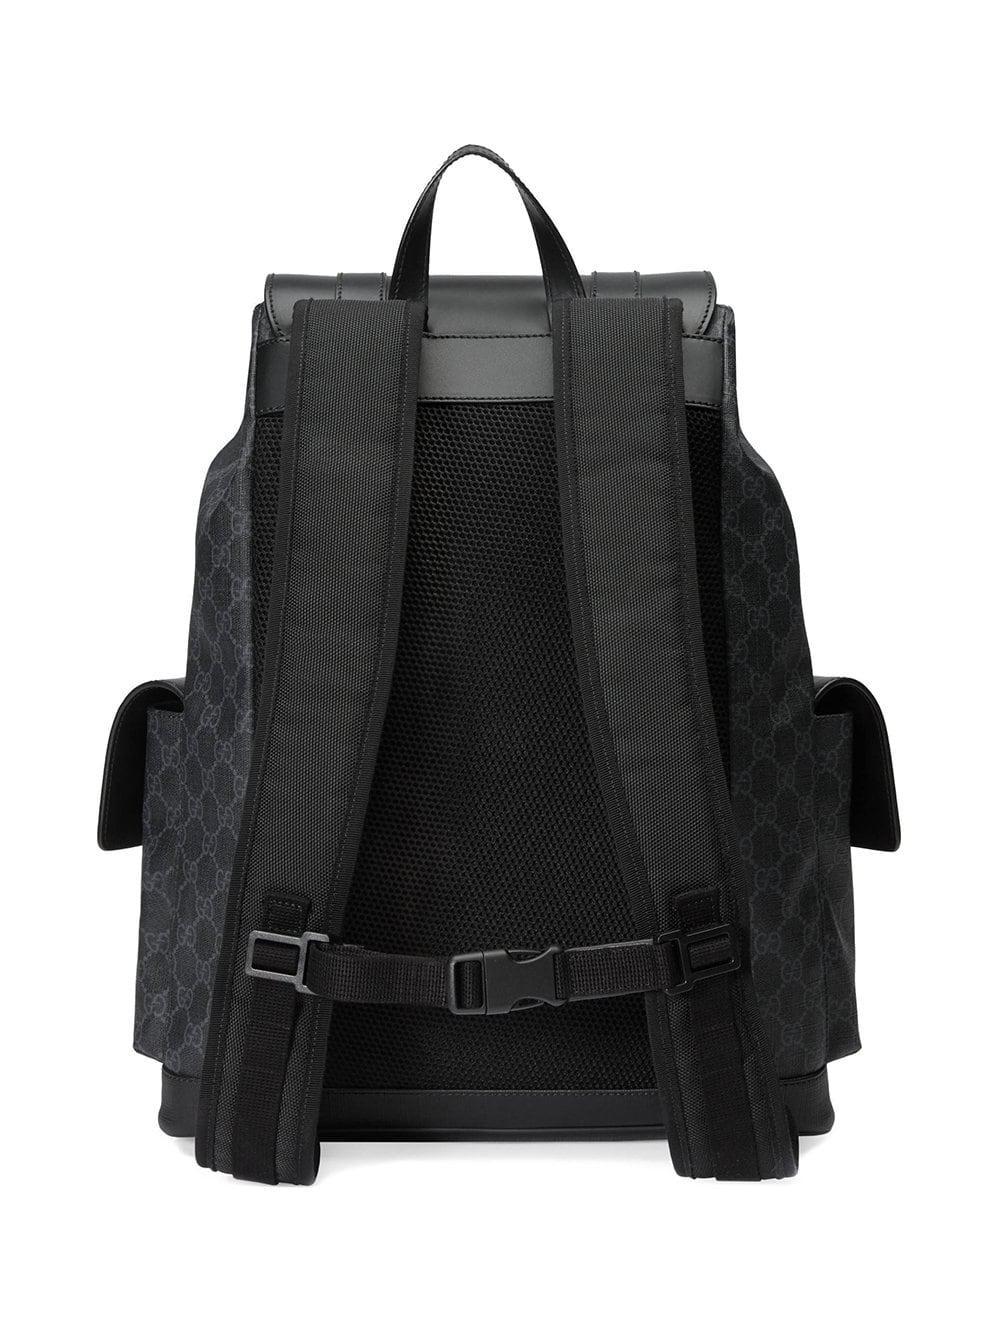 34b15203b07 Lyst - Gucci Soft GG Supreme Backpack in Black for Men